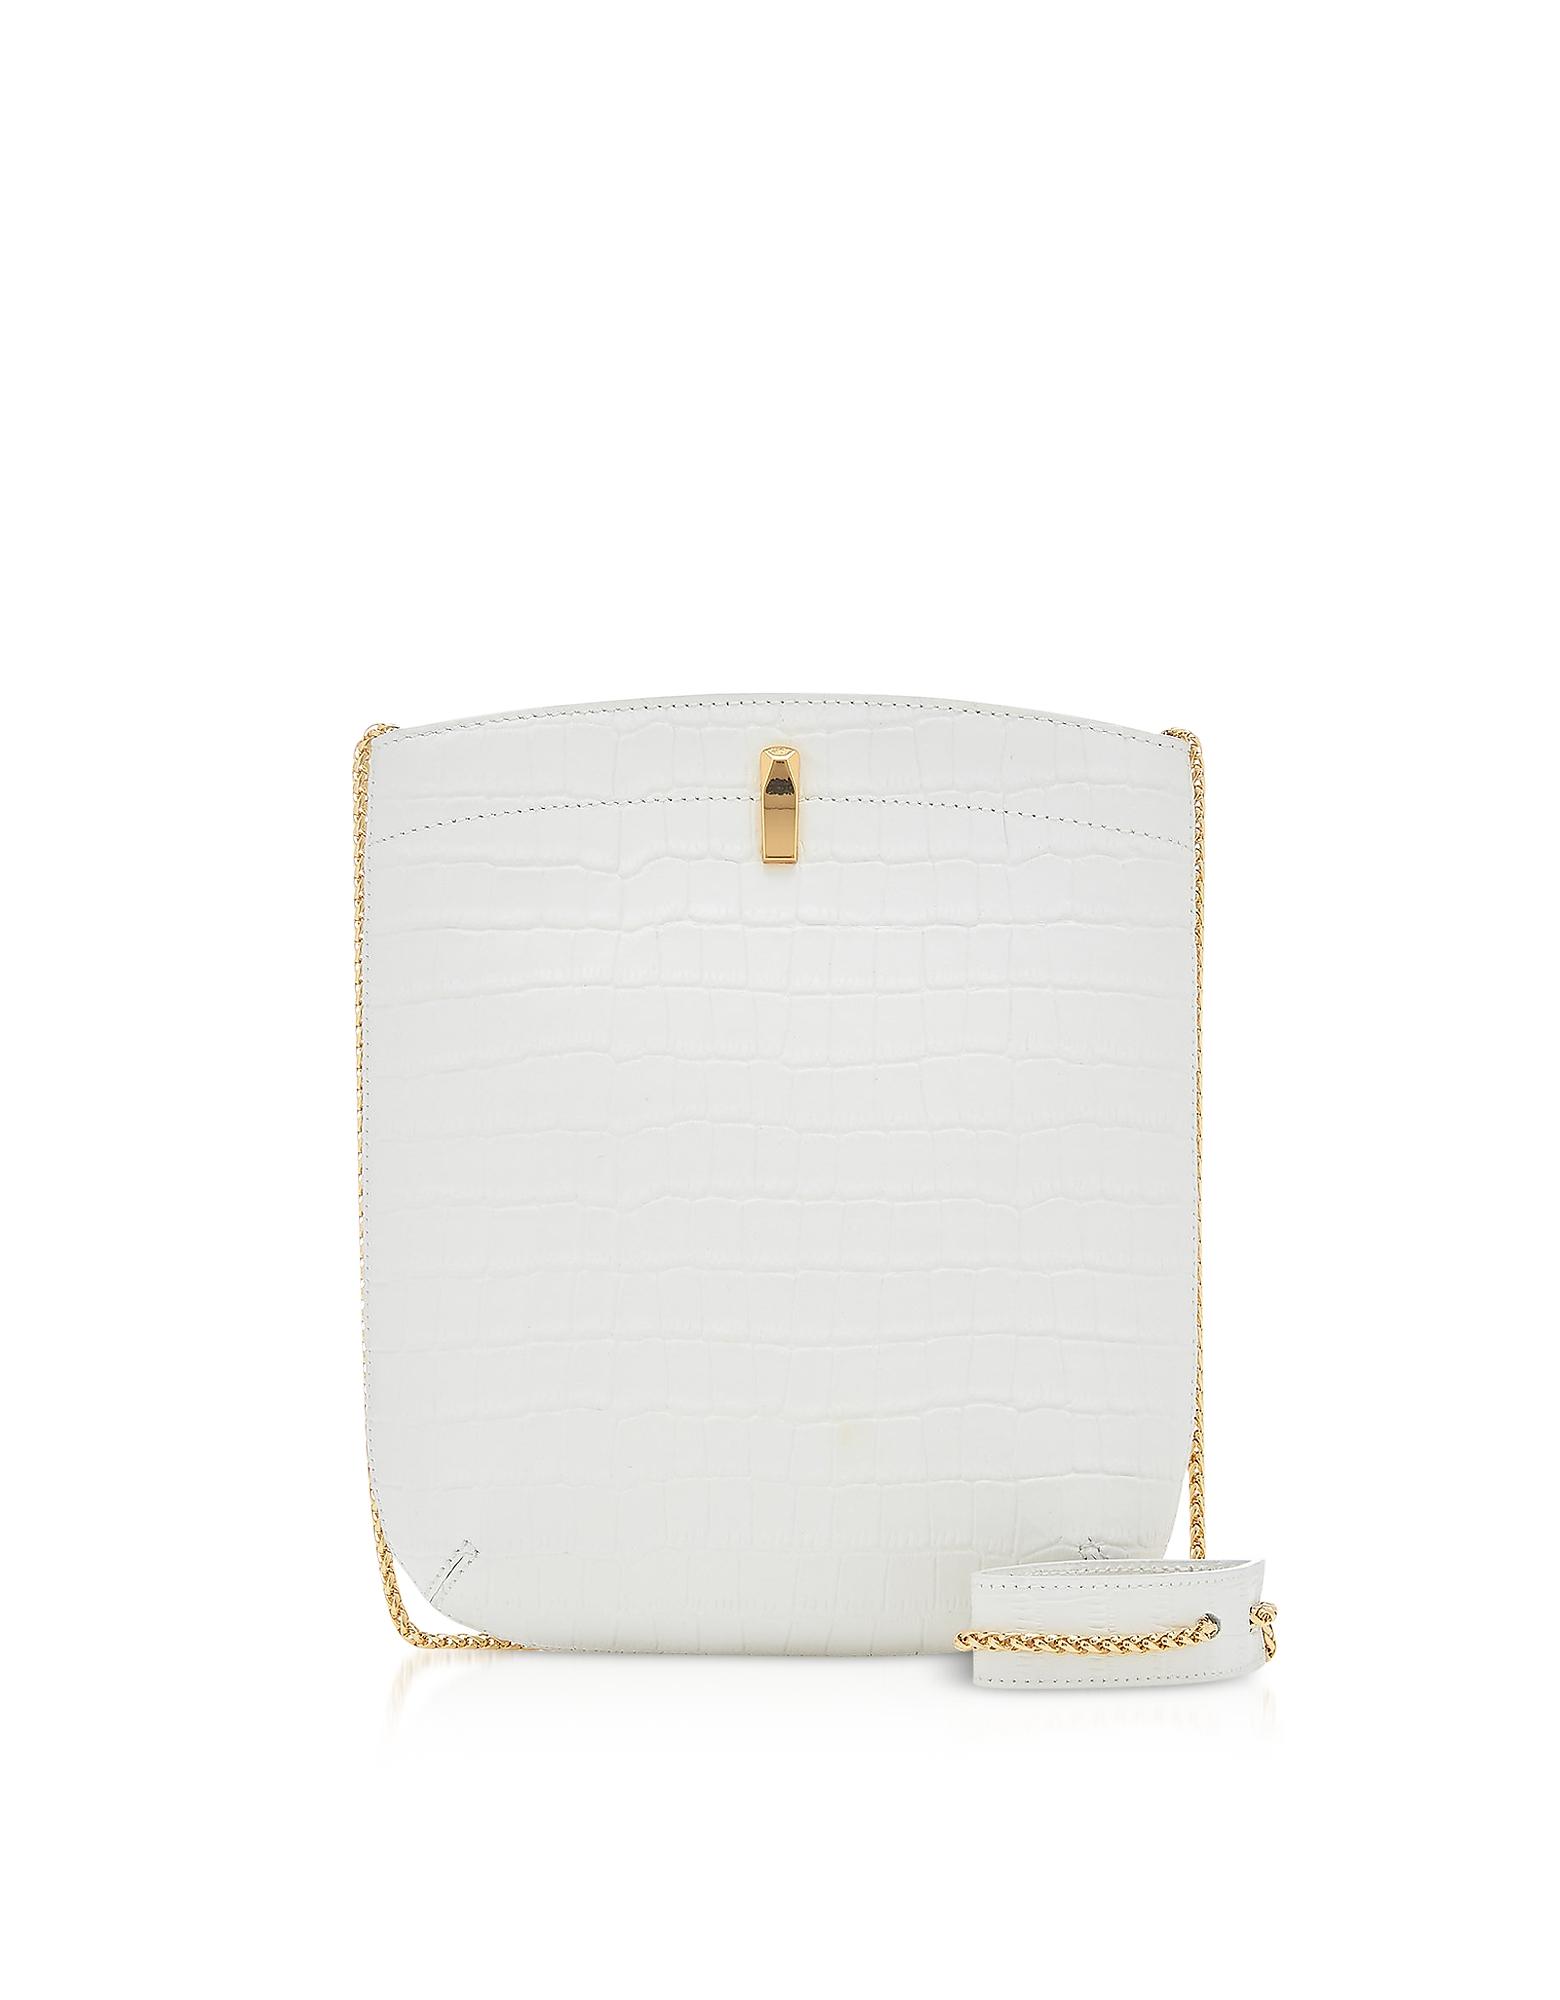 The Volon Designer Handbags, E.Z. Carry Croco-Embossed Leather Bag